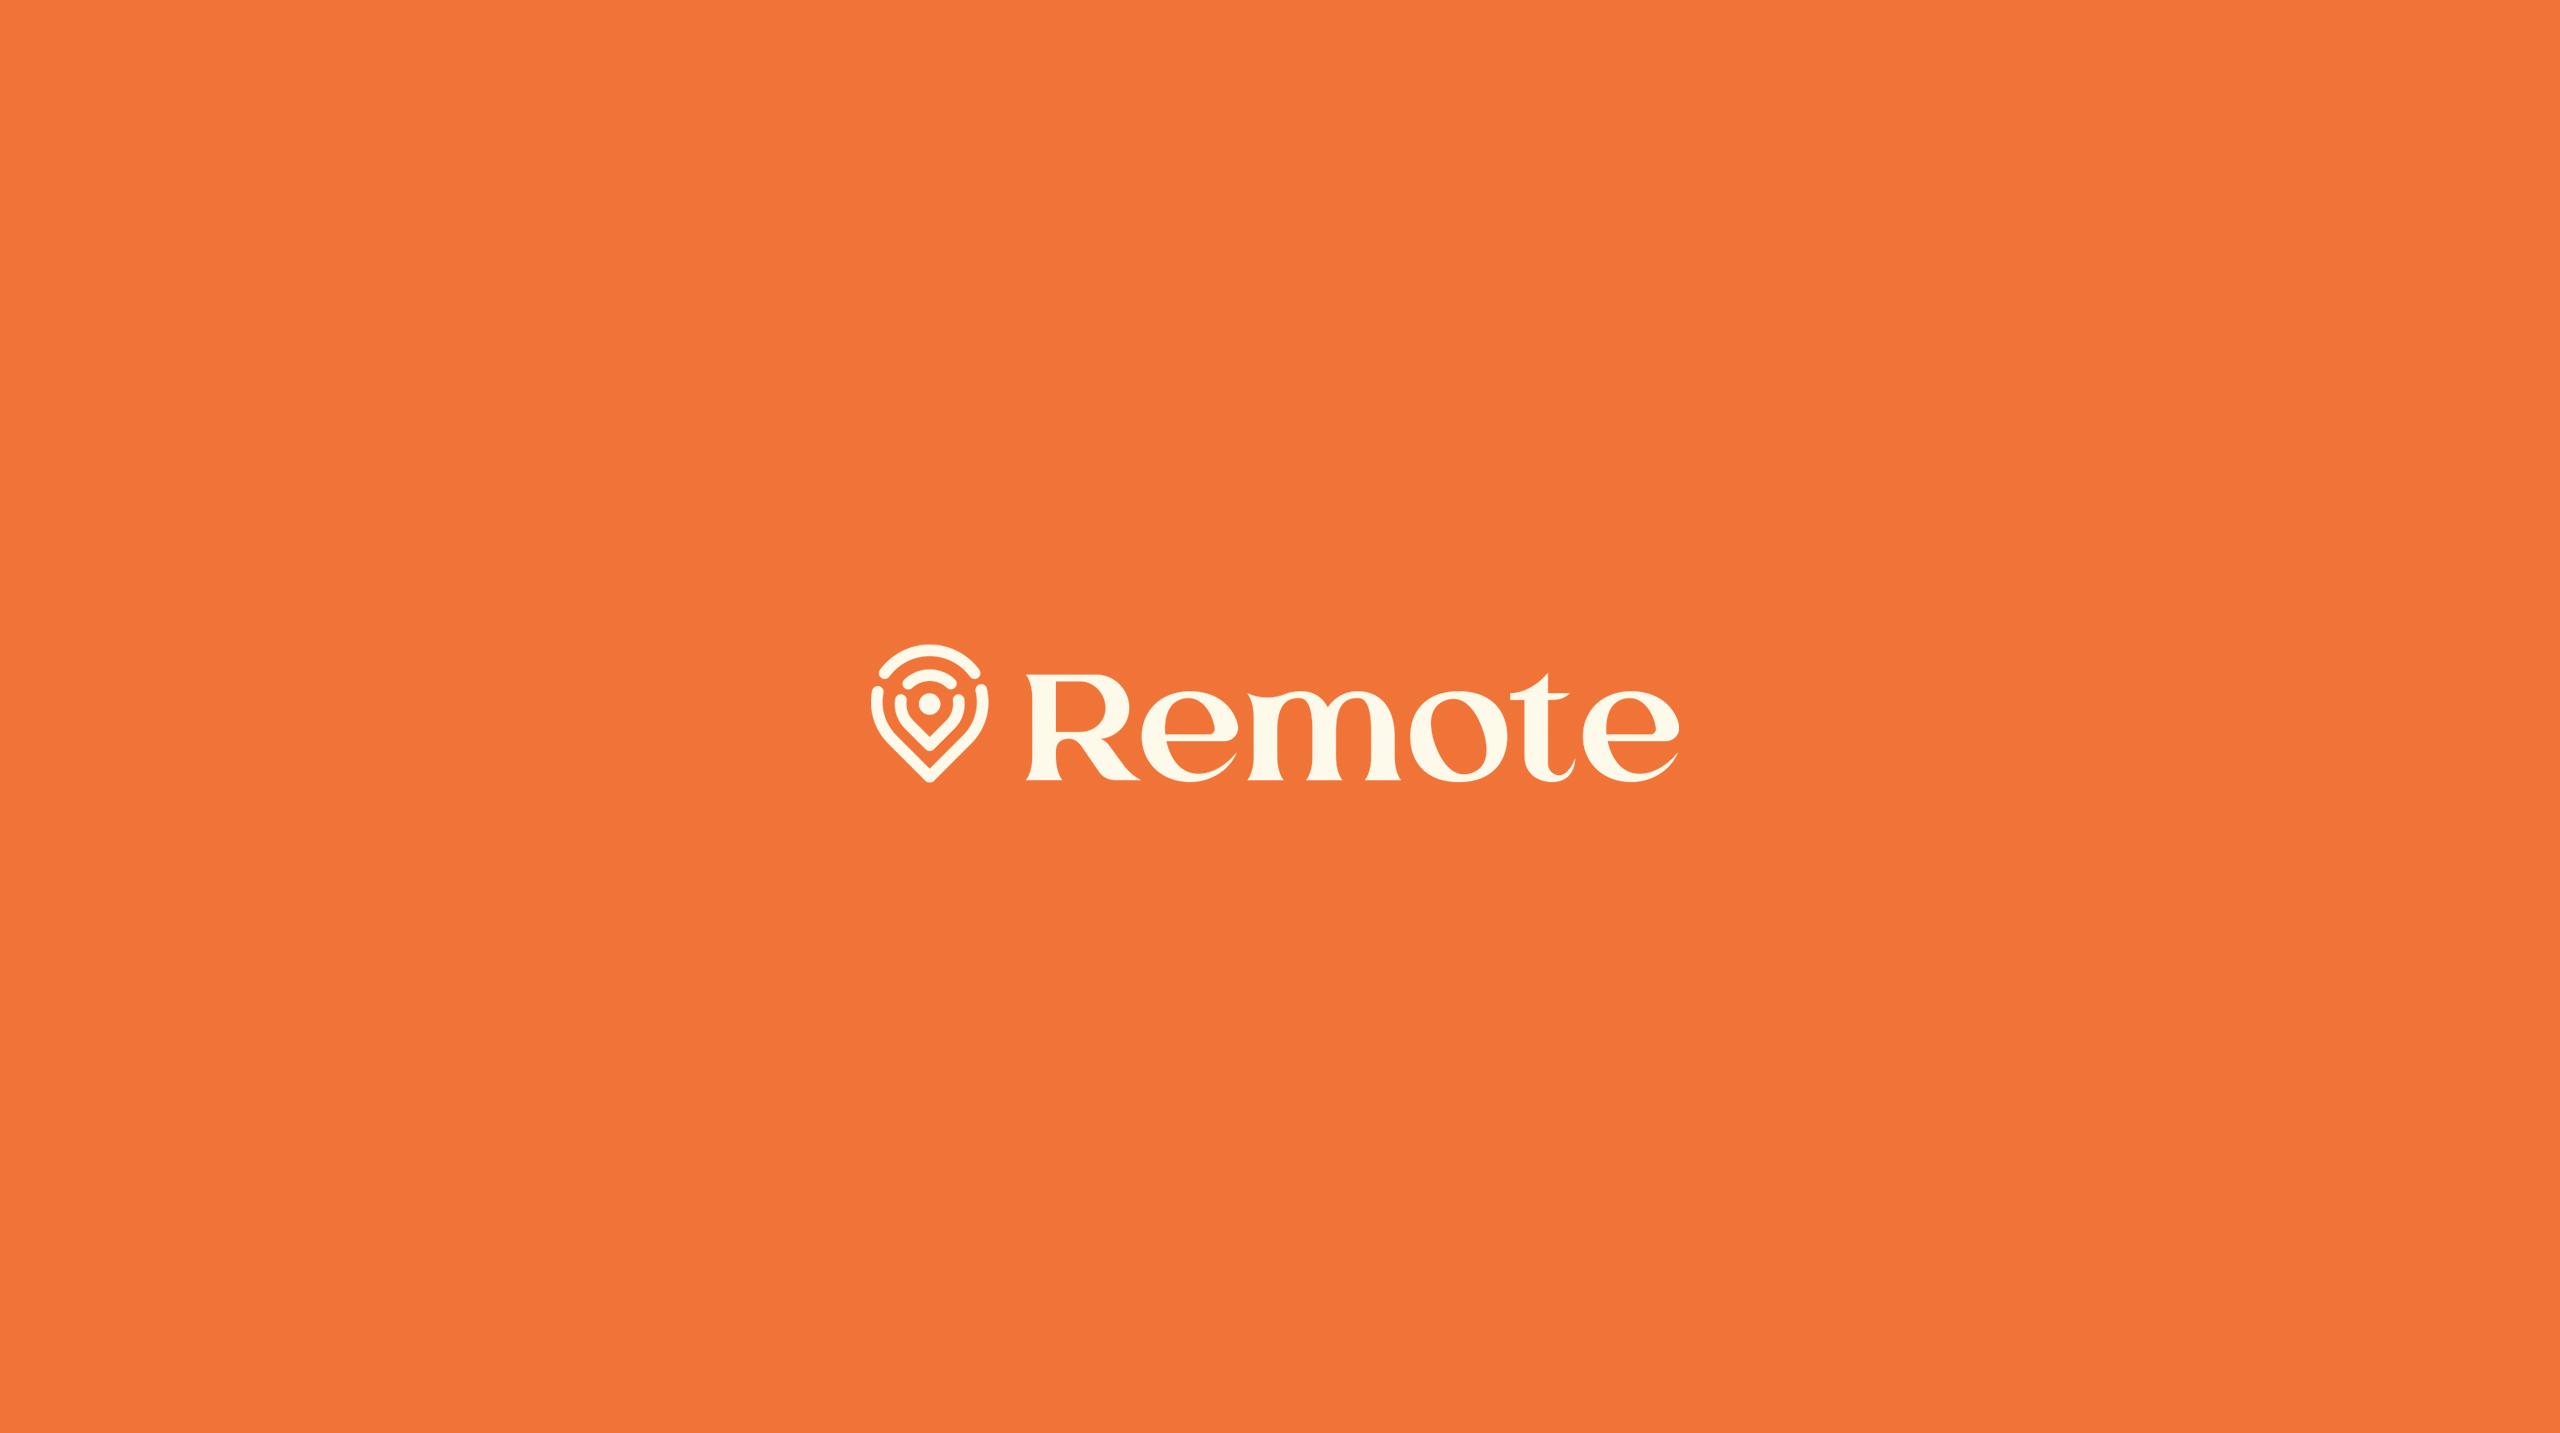 remote_app_final_logo